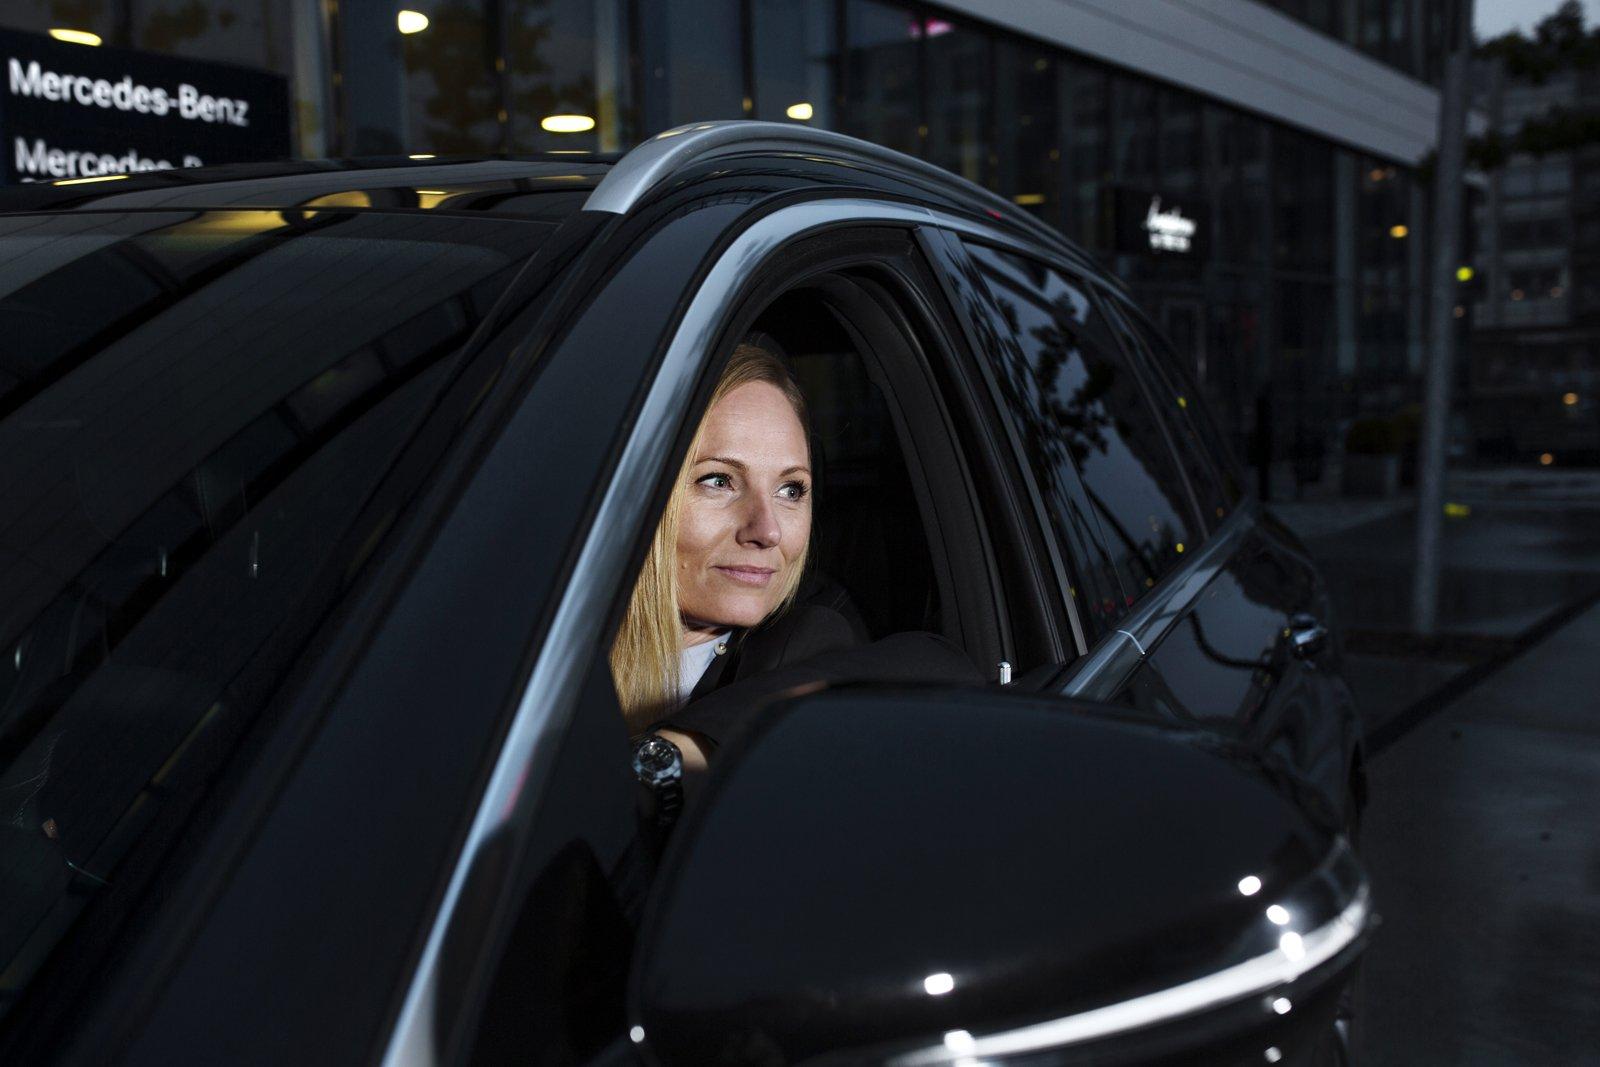 Rikke Hamilton - försäljningschef Mercedes Sverige Danmark. Foton: Jenny Leyman.